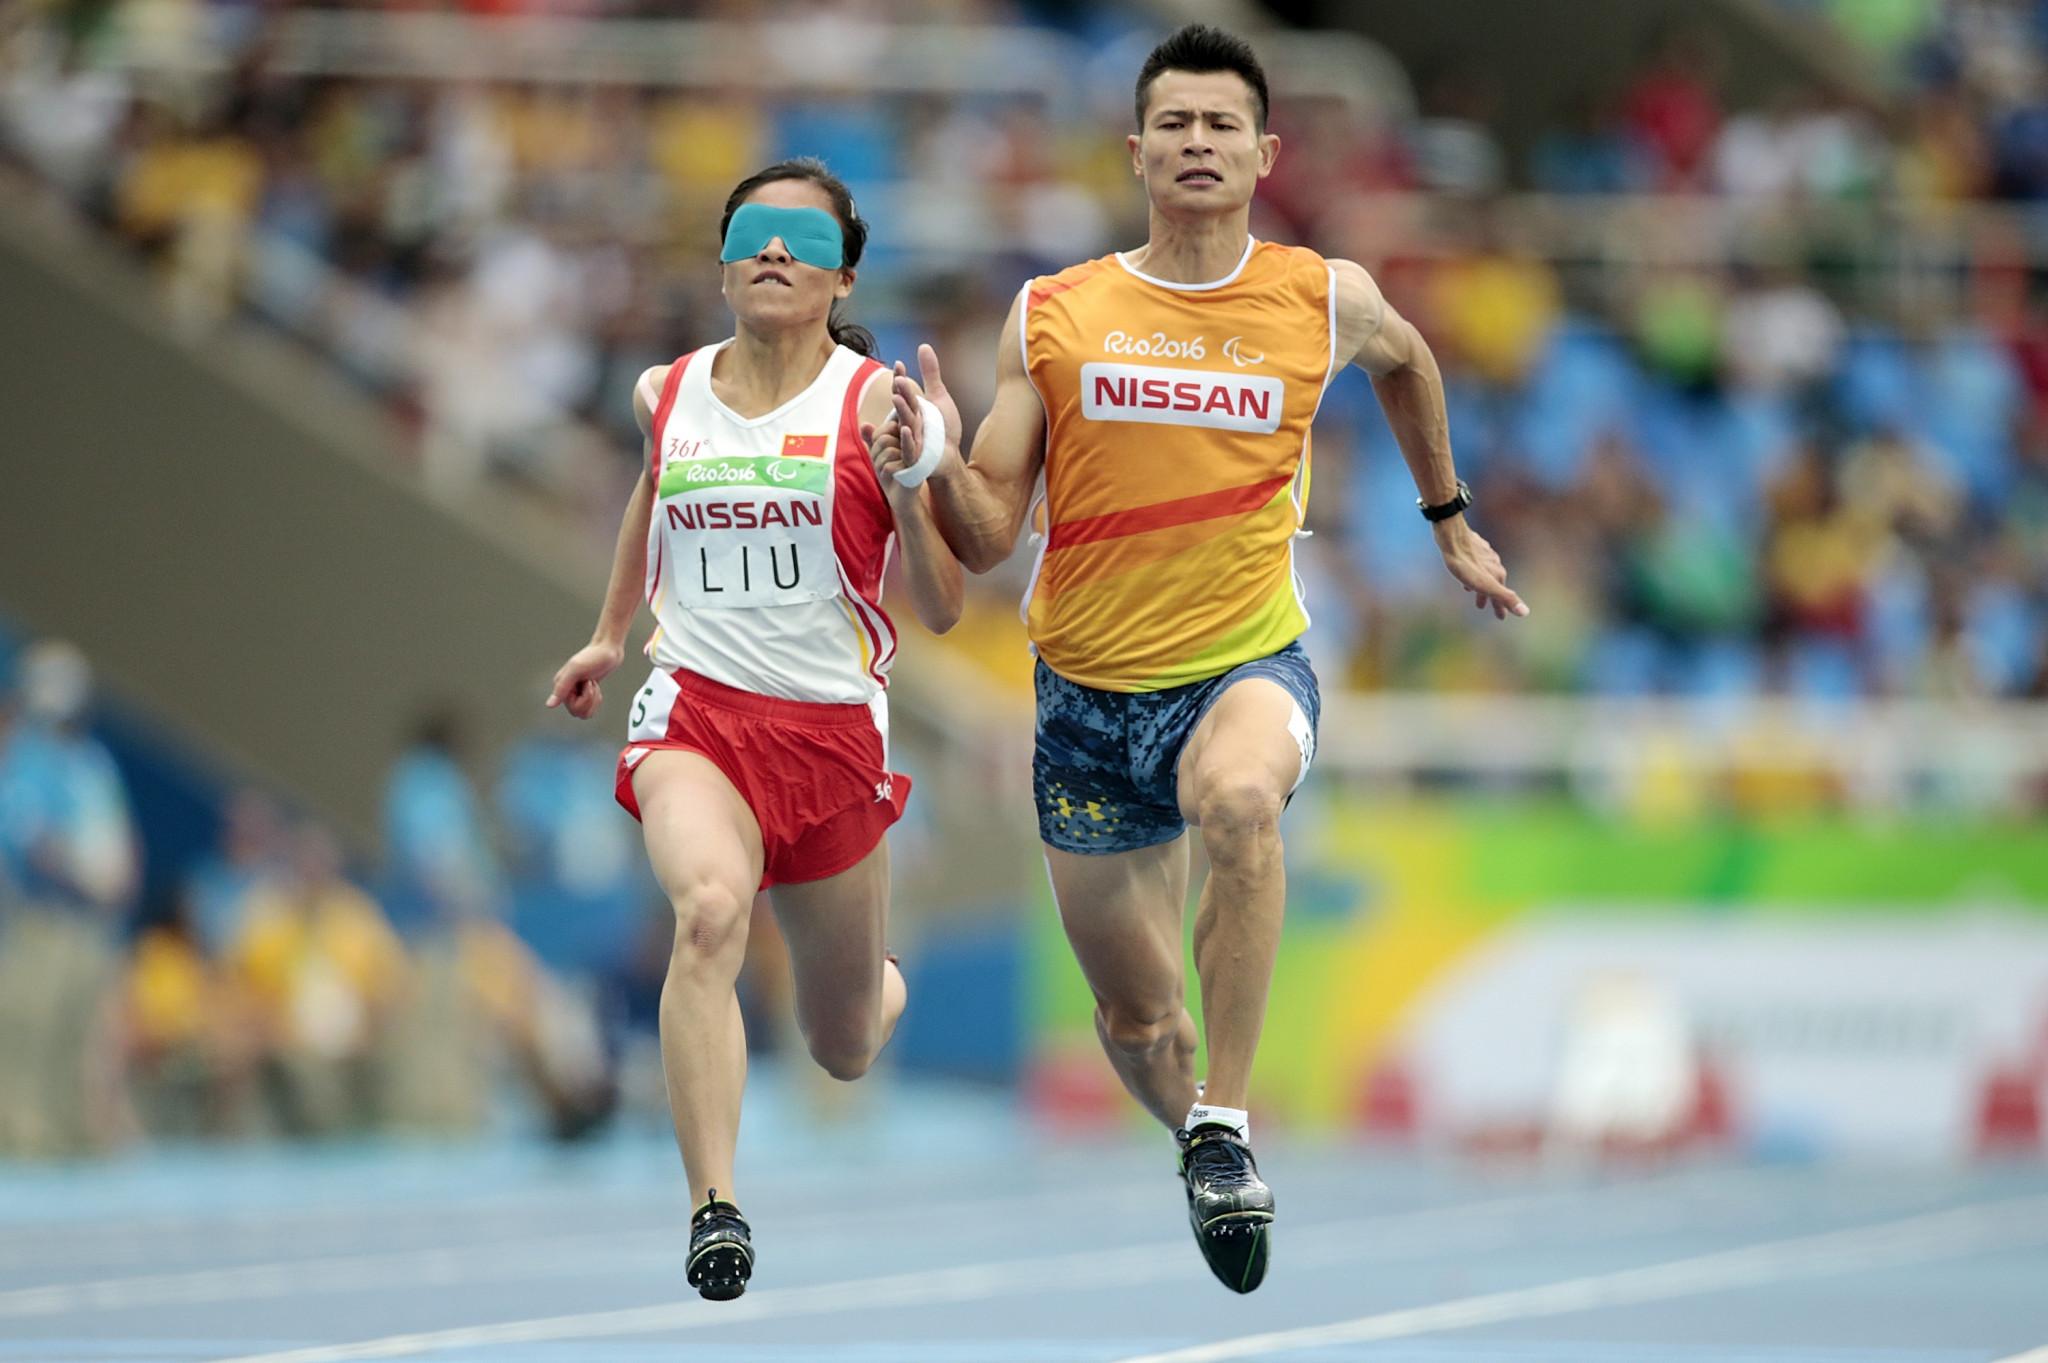 Paralympic champion Liu breaks world record on final day of World Para Athletics Grand Prix